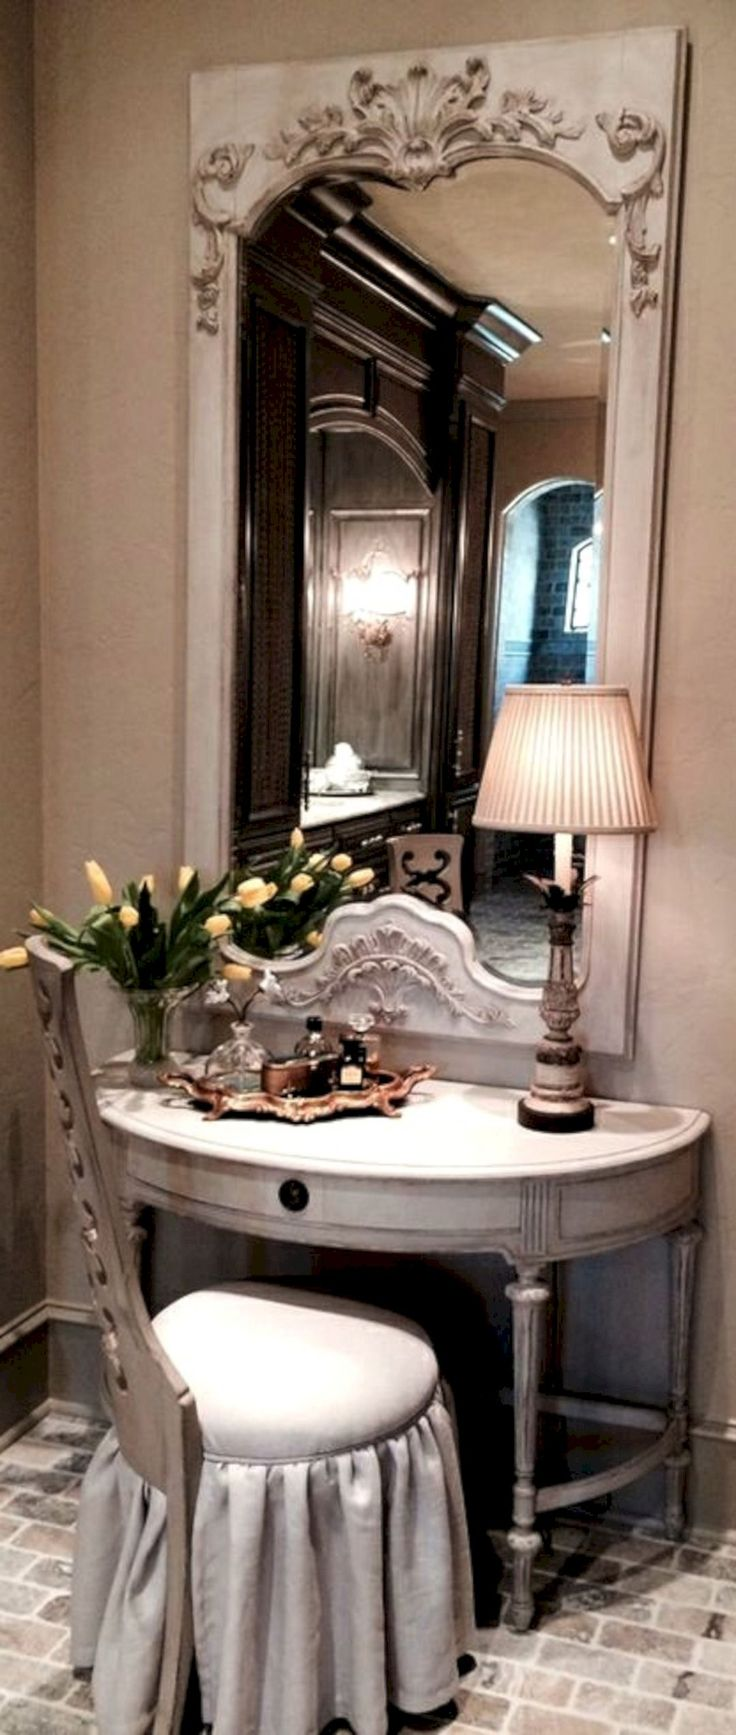 Best 52+ Best And Amazing Spanish Style Bedroom Furniture Design Ideas https://decoredo.com/8155-52-best-and-amazing-spanish-style-bedroom-furniture-design-ideas/